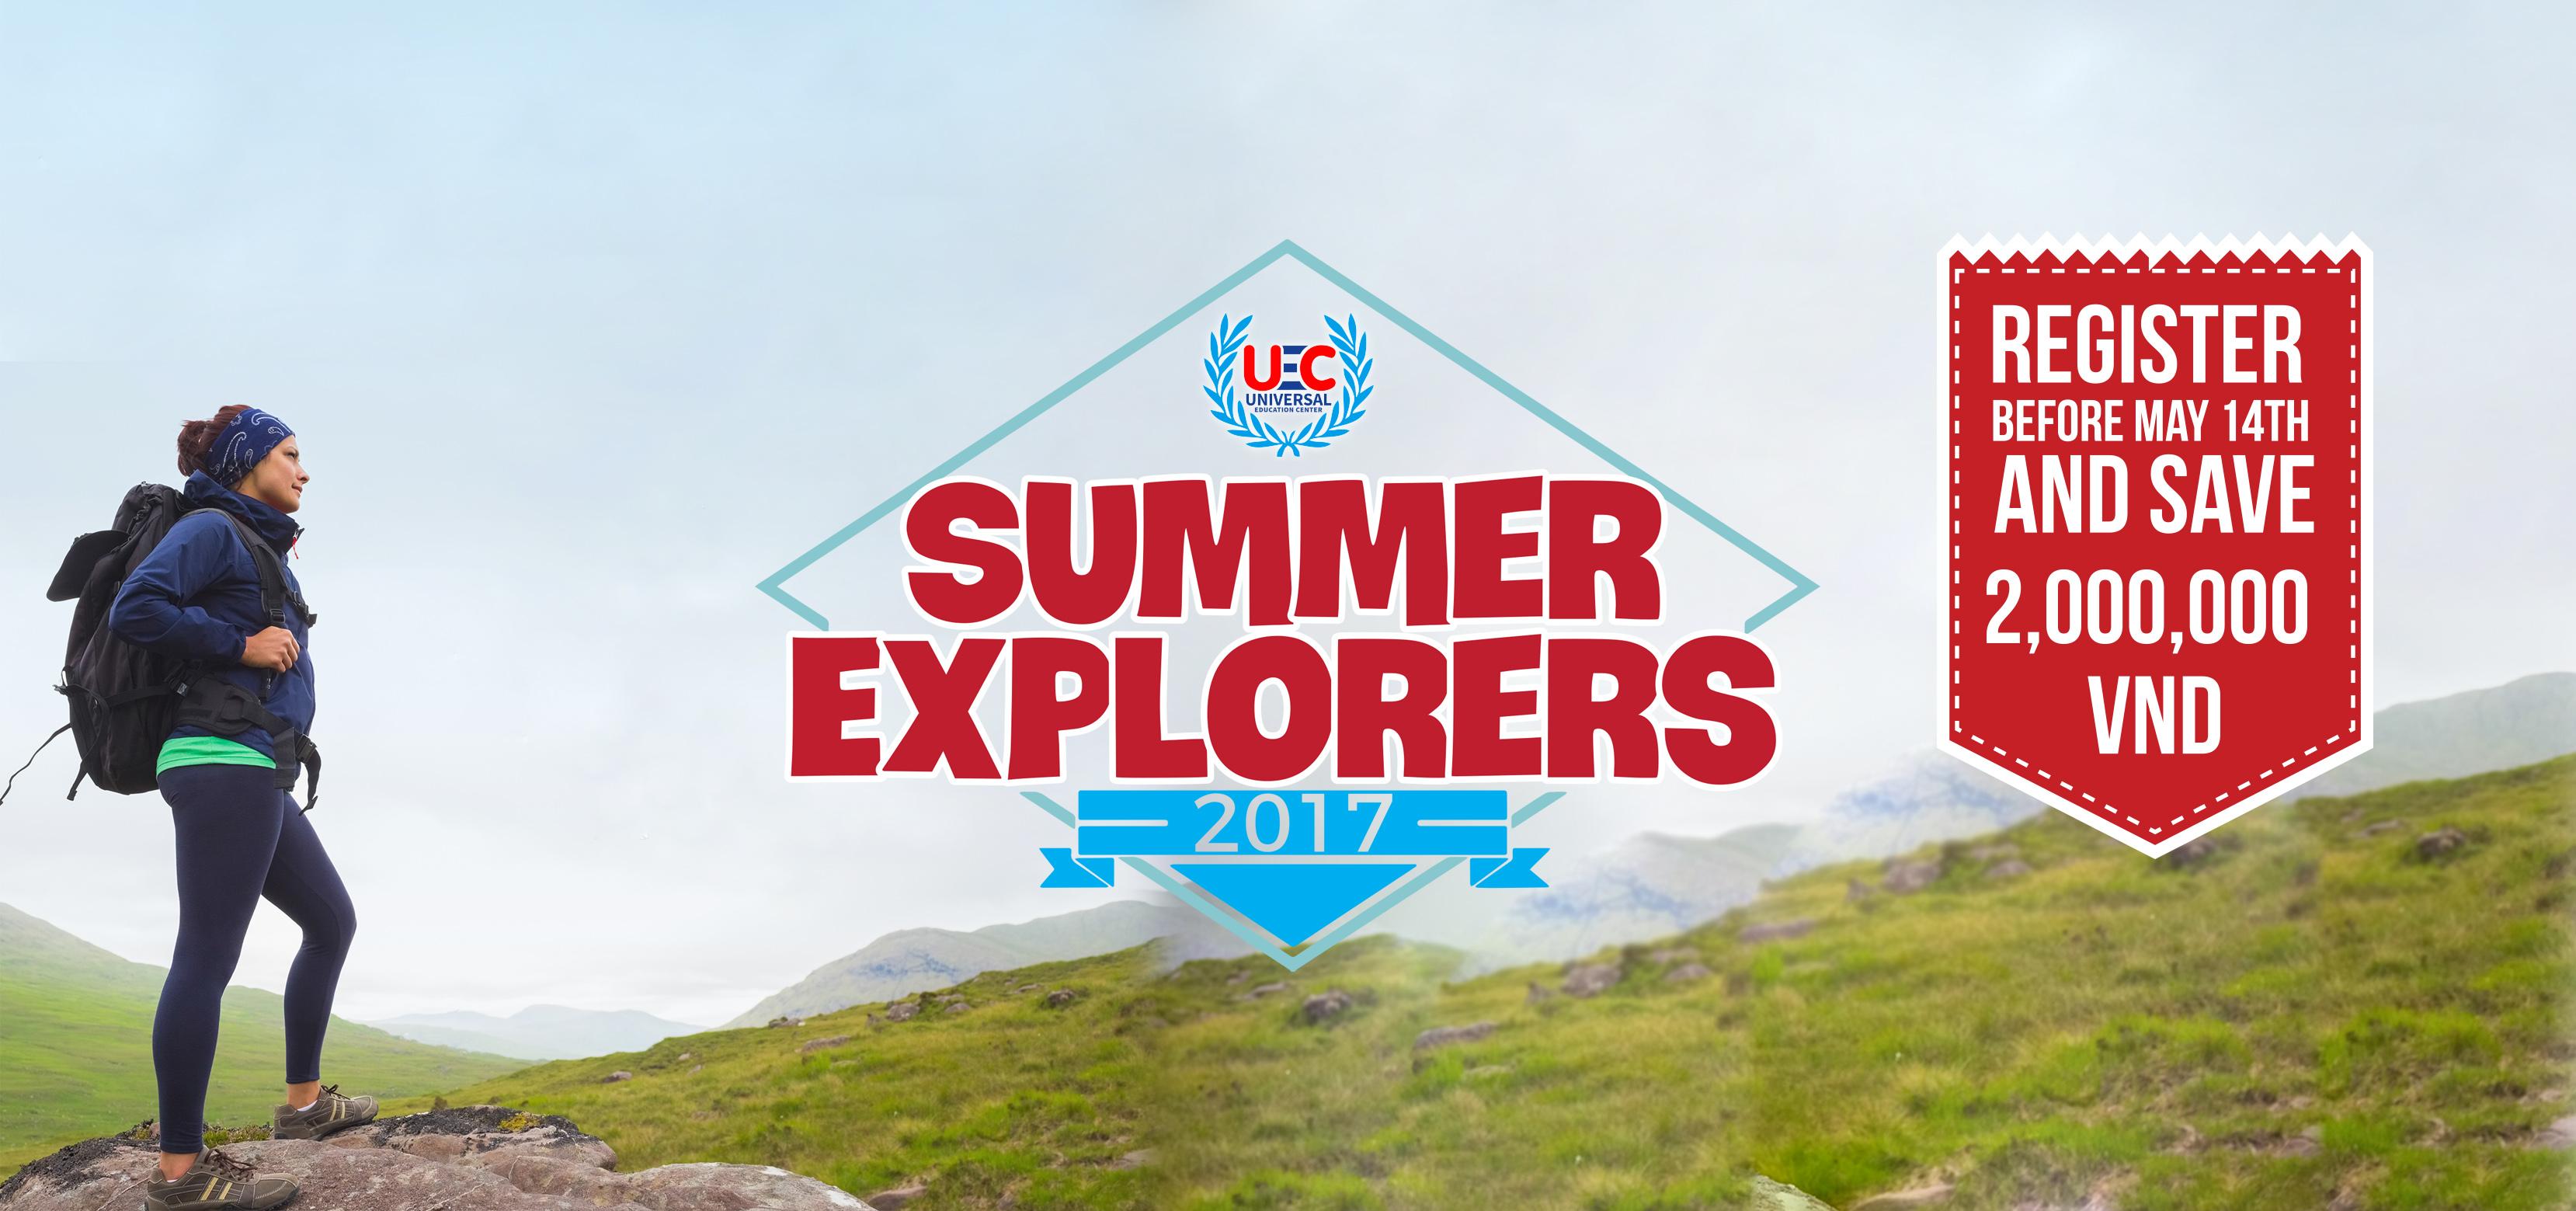 Summer Explorers 2017